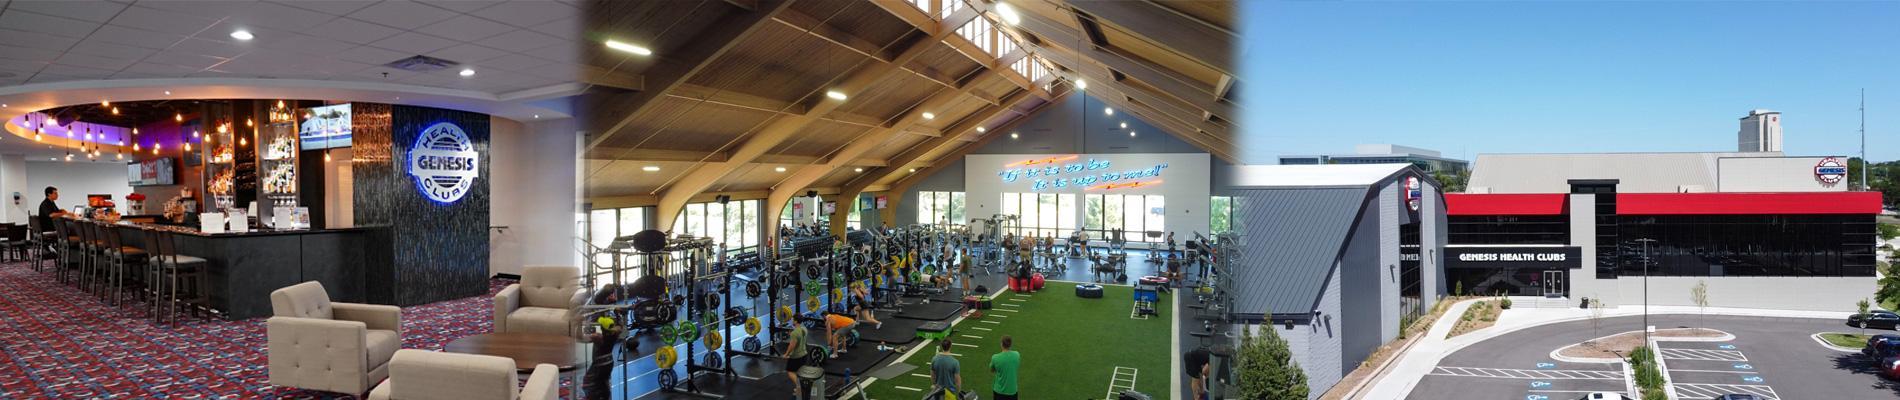 overland park gym genesis health clubs kansas city area genesis health clubs kansas city